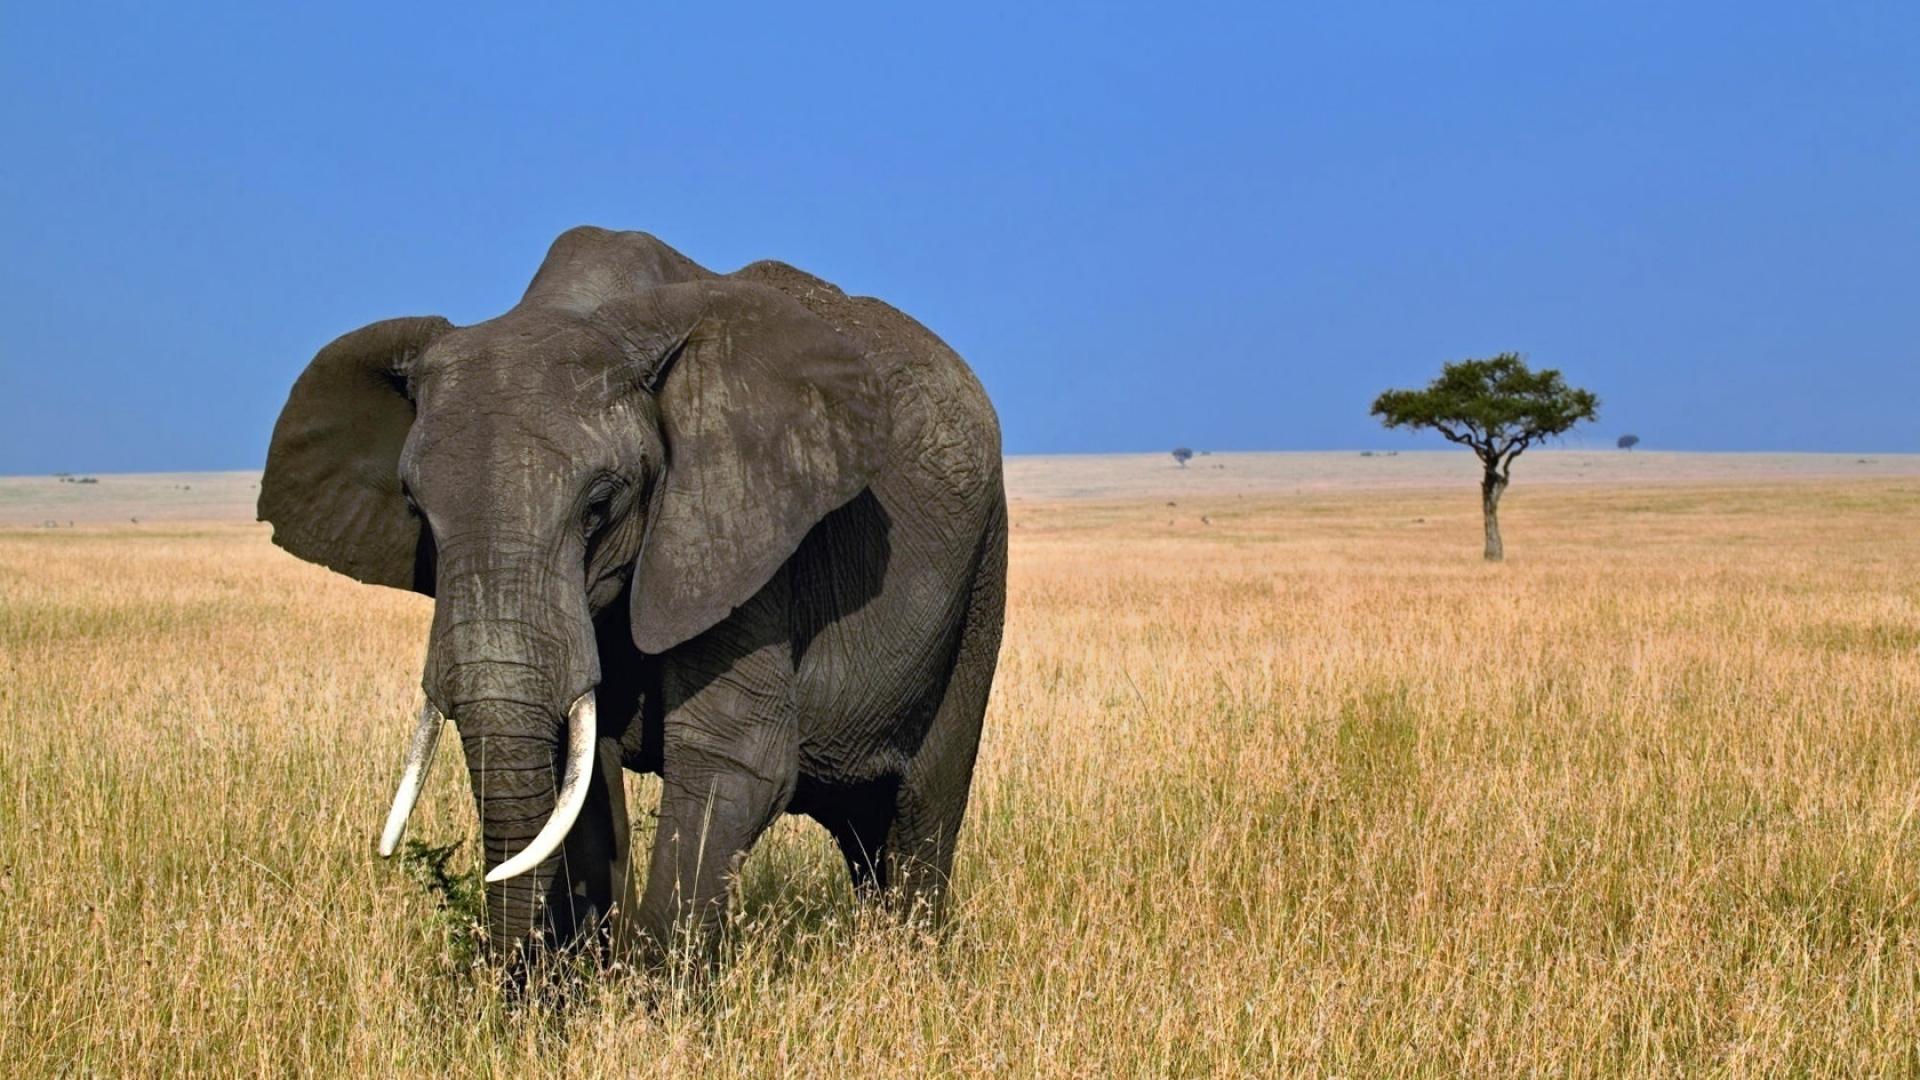 Download Wallpaper 1920x1080 Elephant Safari Africa